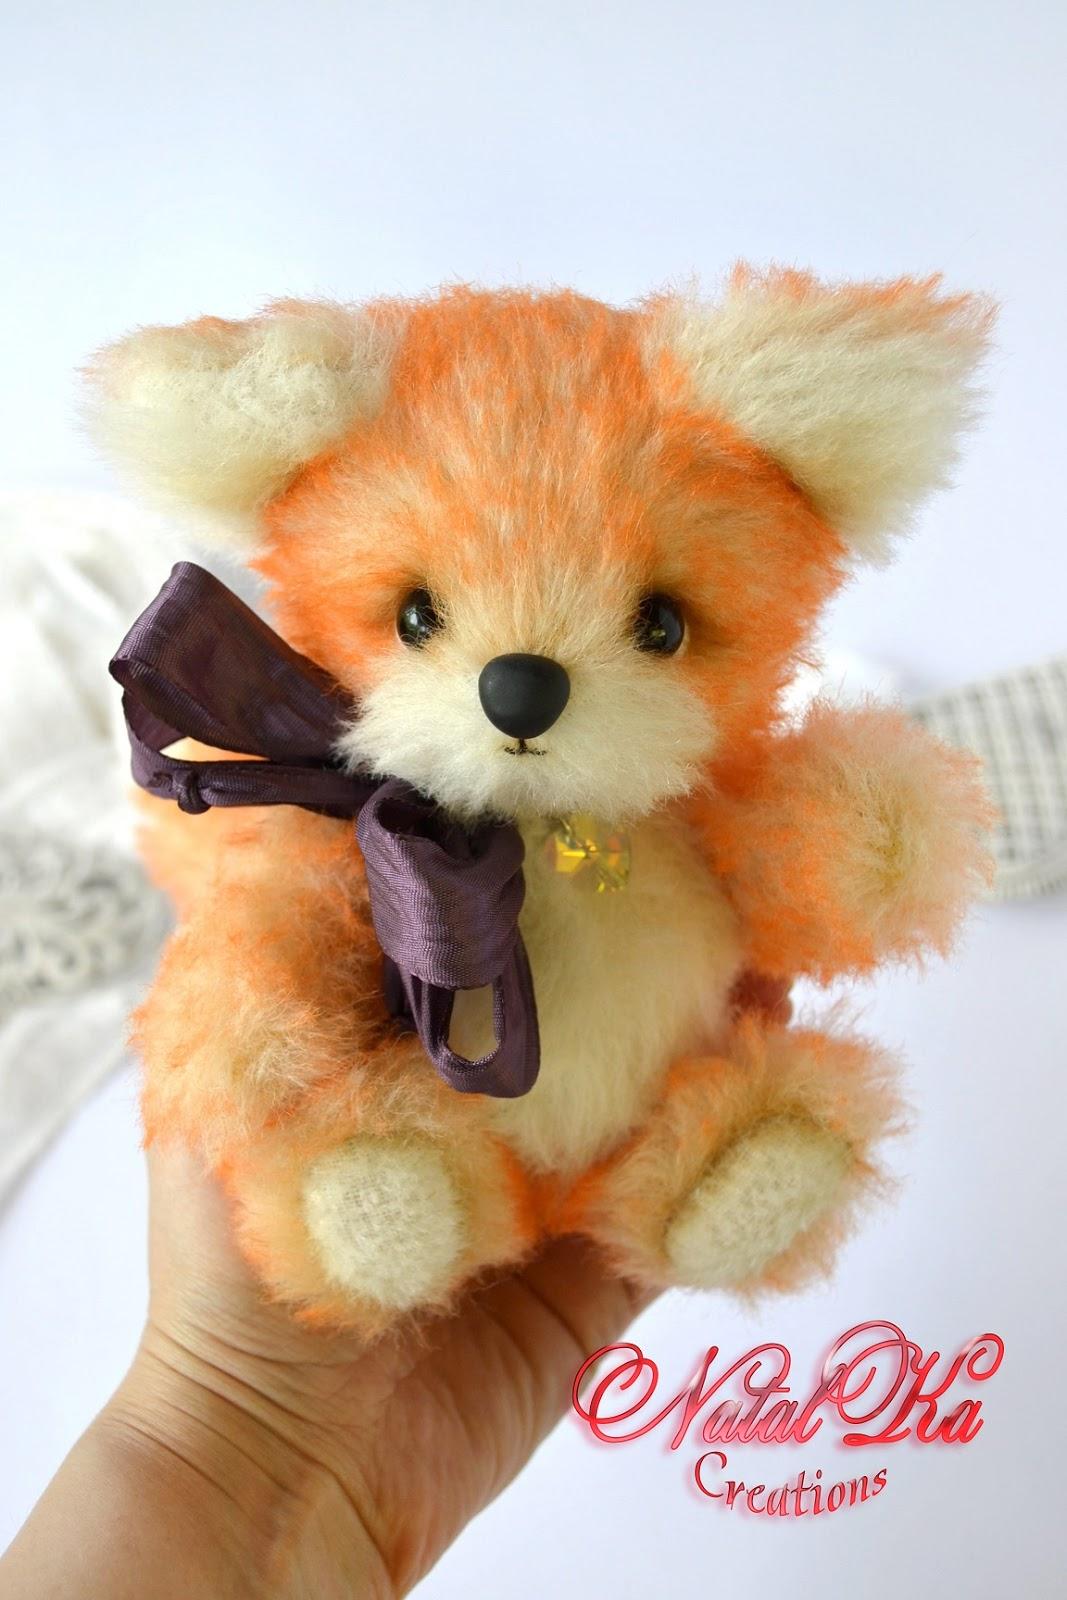 Artist teddy fox handmade by NatalKa Creations. Авторский лисенок тедди ручной работы от NatalKa Creations.